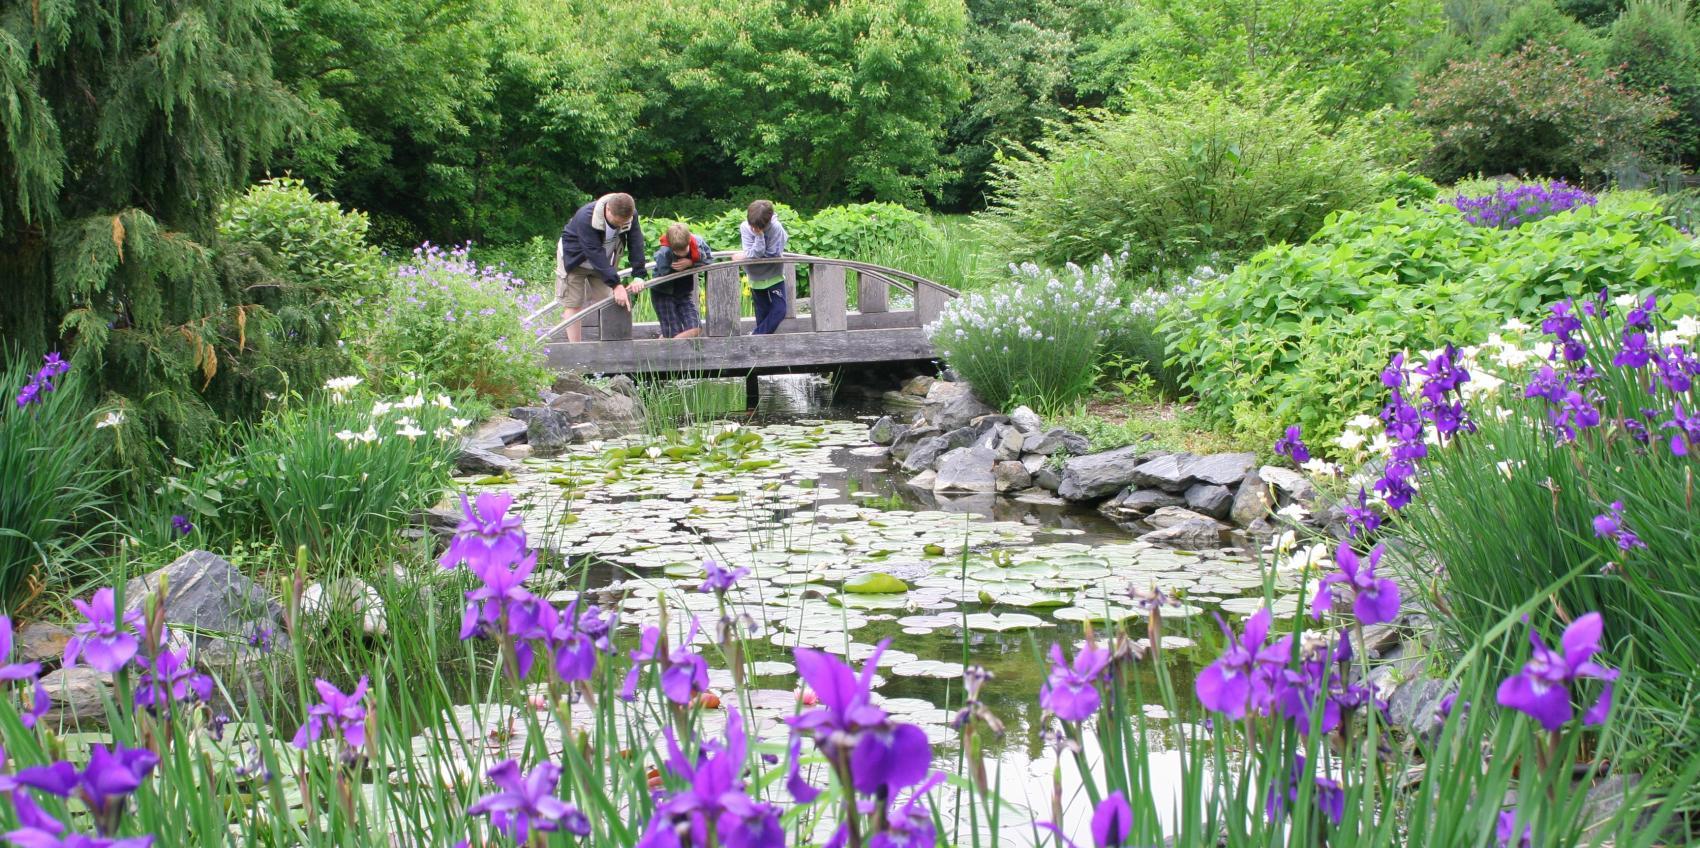 Klehm arboretum botanic garden american public gardens for Garden information sites